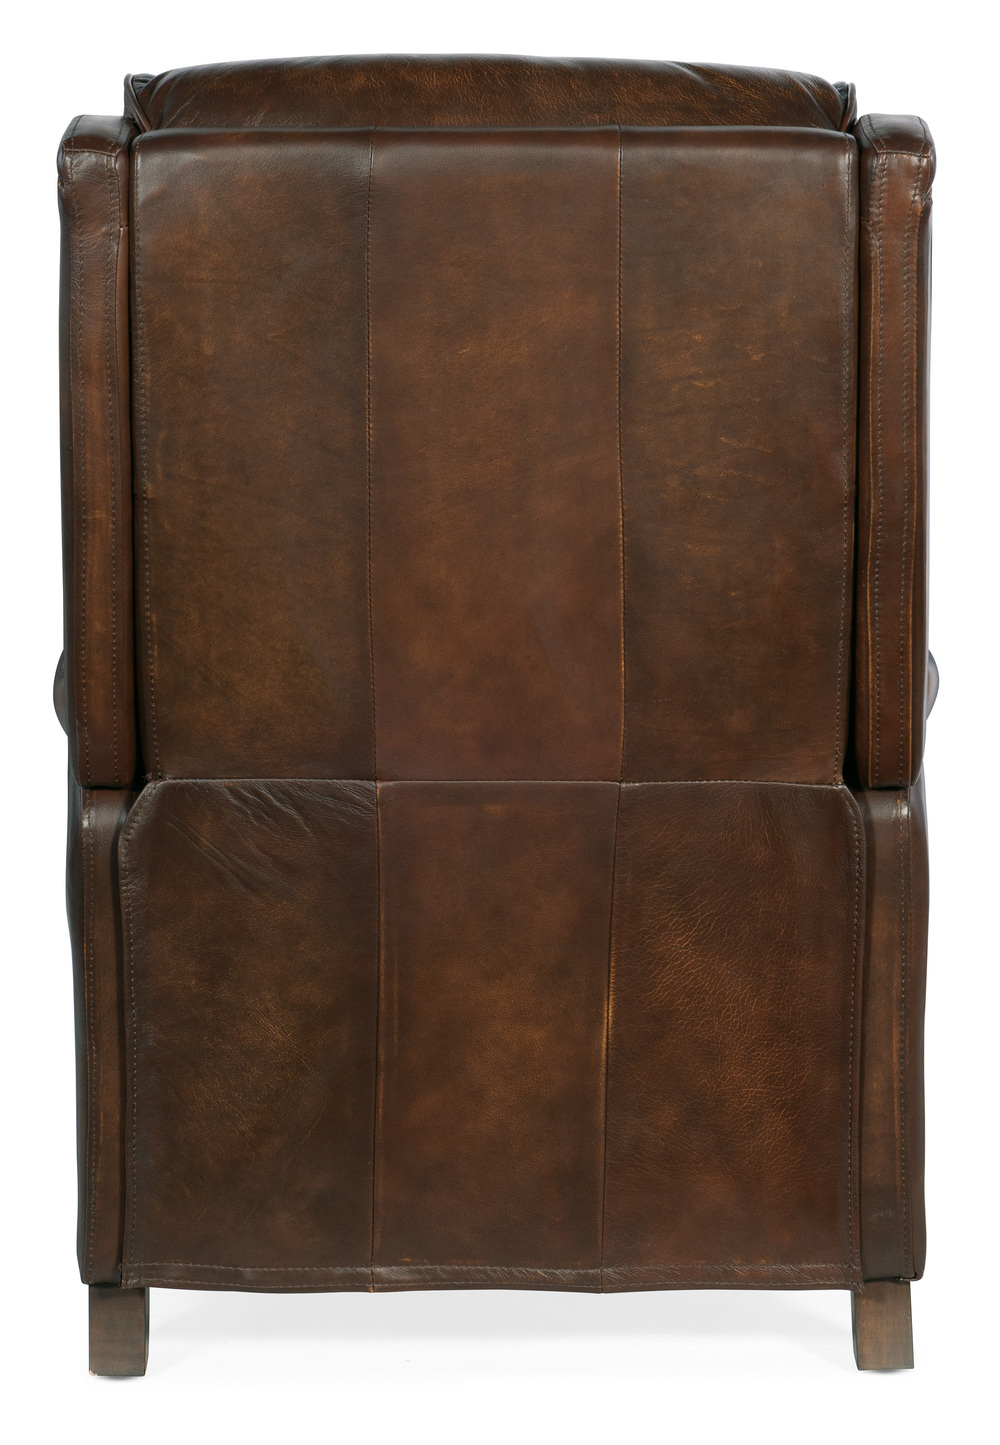 Hooker Furniture - Stark Manual Push Back Recliner